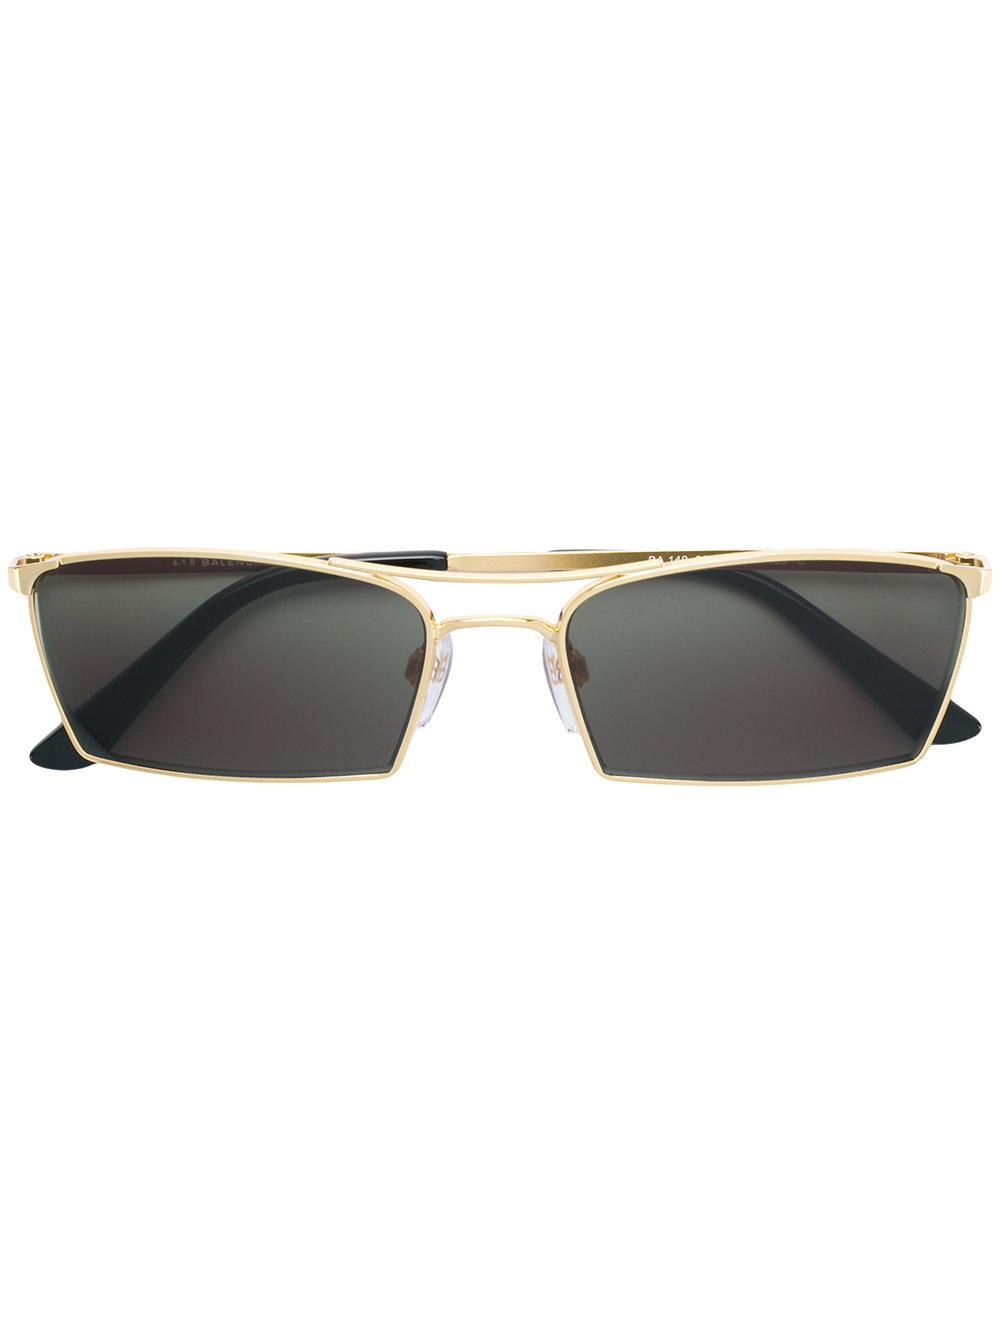 balenciaga Kuboraum Ambush illesteva ivory baxter narrow sunglasses narrow rectangular sunglasses small sunglasses trend 90s sunglasses where to buy tiny sunglasses tiny 90s sunglasses narrow frame sunglasses tiny sunglasses trend